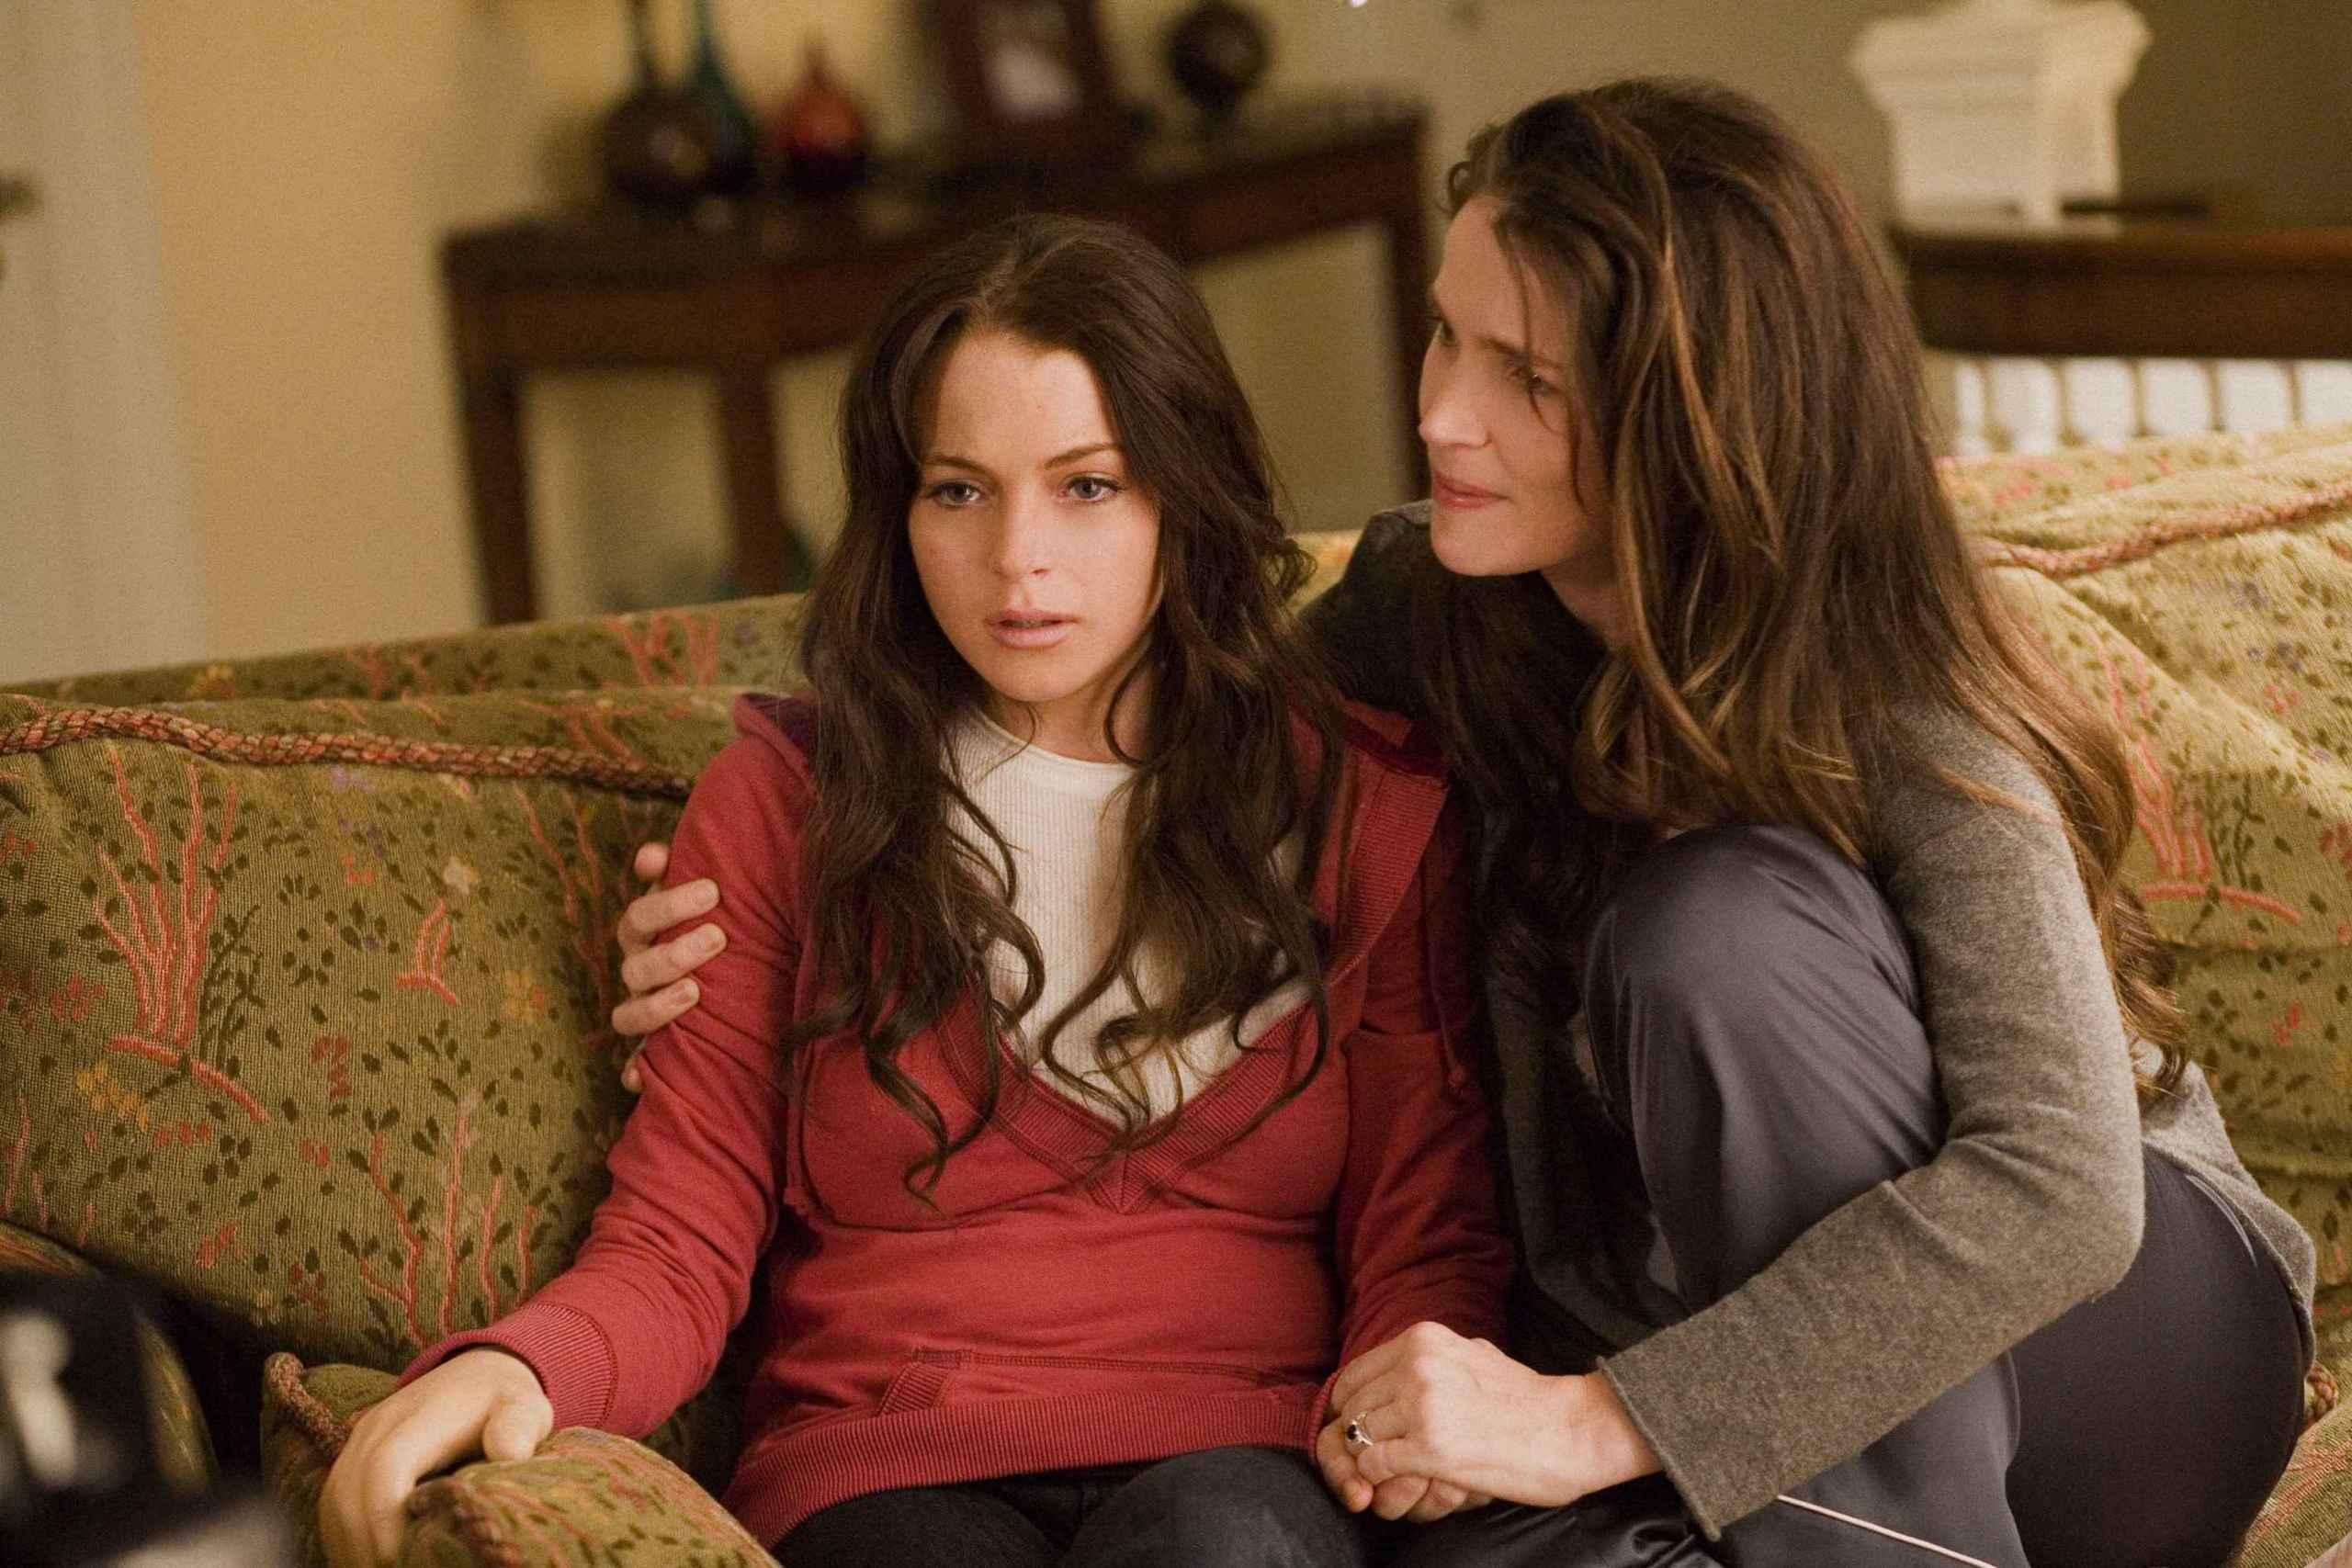 Lindsay Lohan (left) and Julia Ormond star in TriStar Pictures' psychological thriller I KNOW WHO KILLED ME.